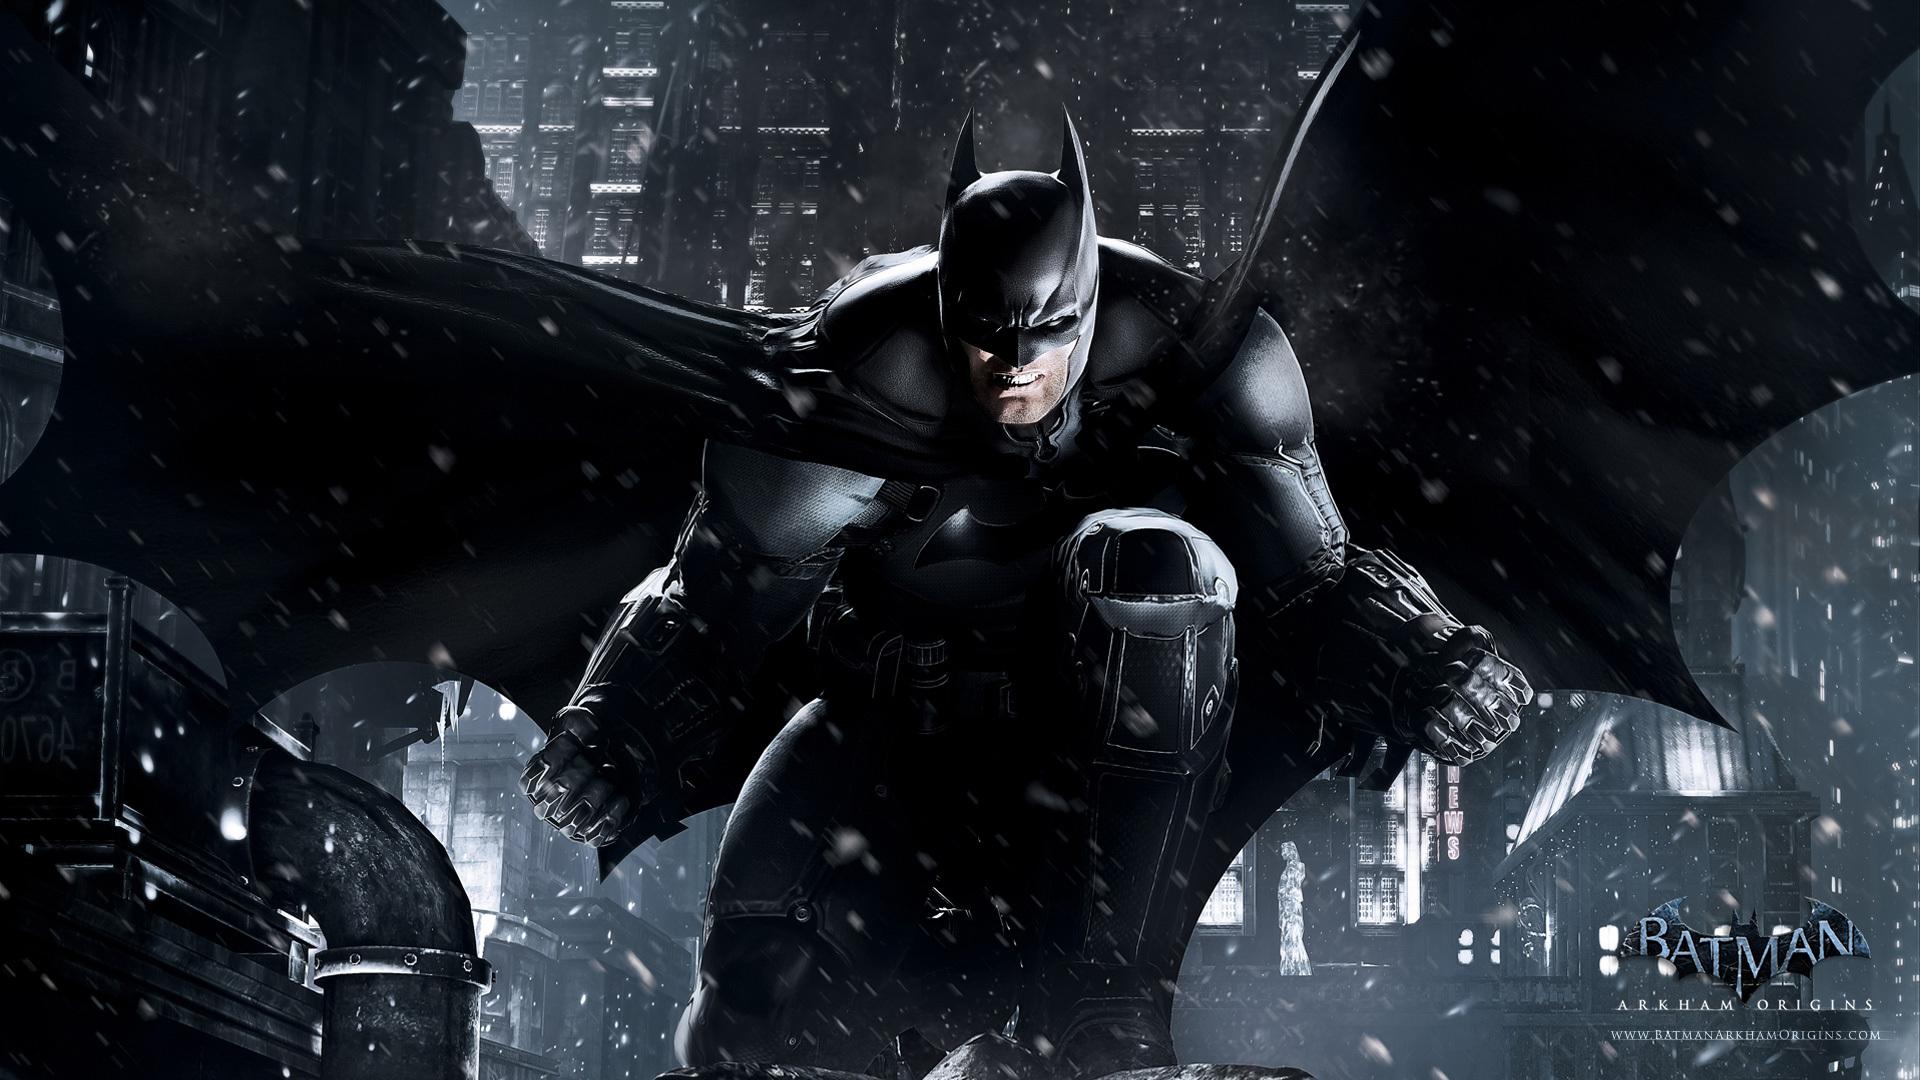 2013 Batman Arkham Origins Wallpapers HD Wallpapers 1920x1080